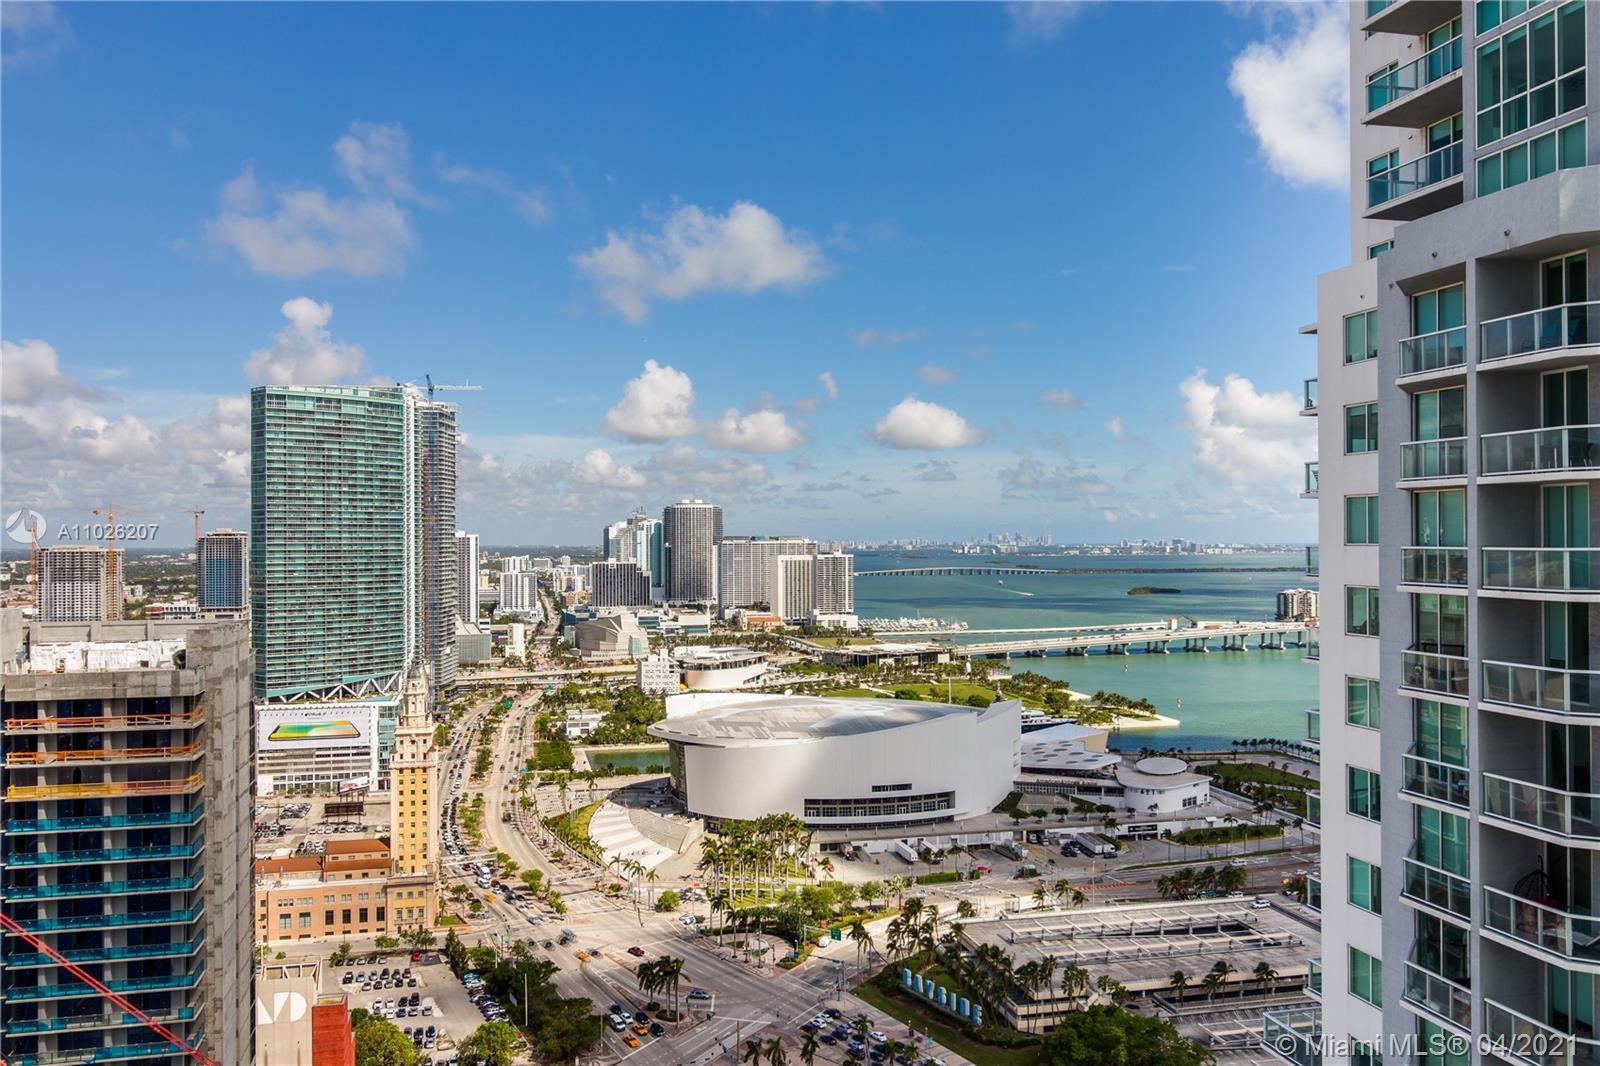 Vizcayne Two #3702 - 253 NE 2nd St #3702, Miami, FL 33132